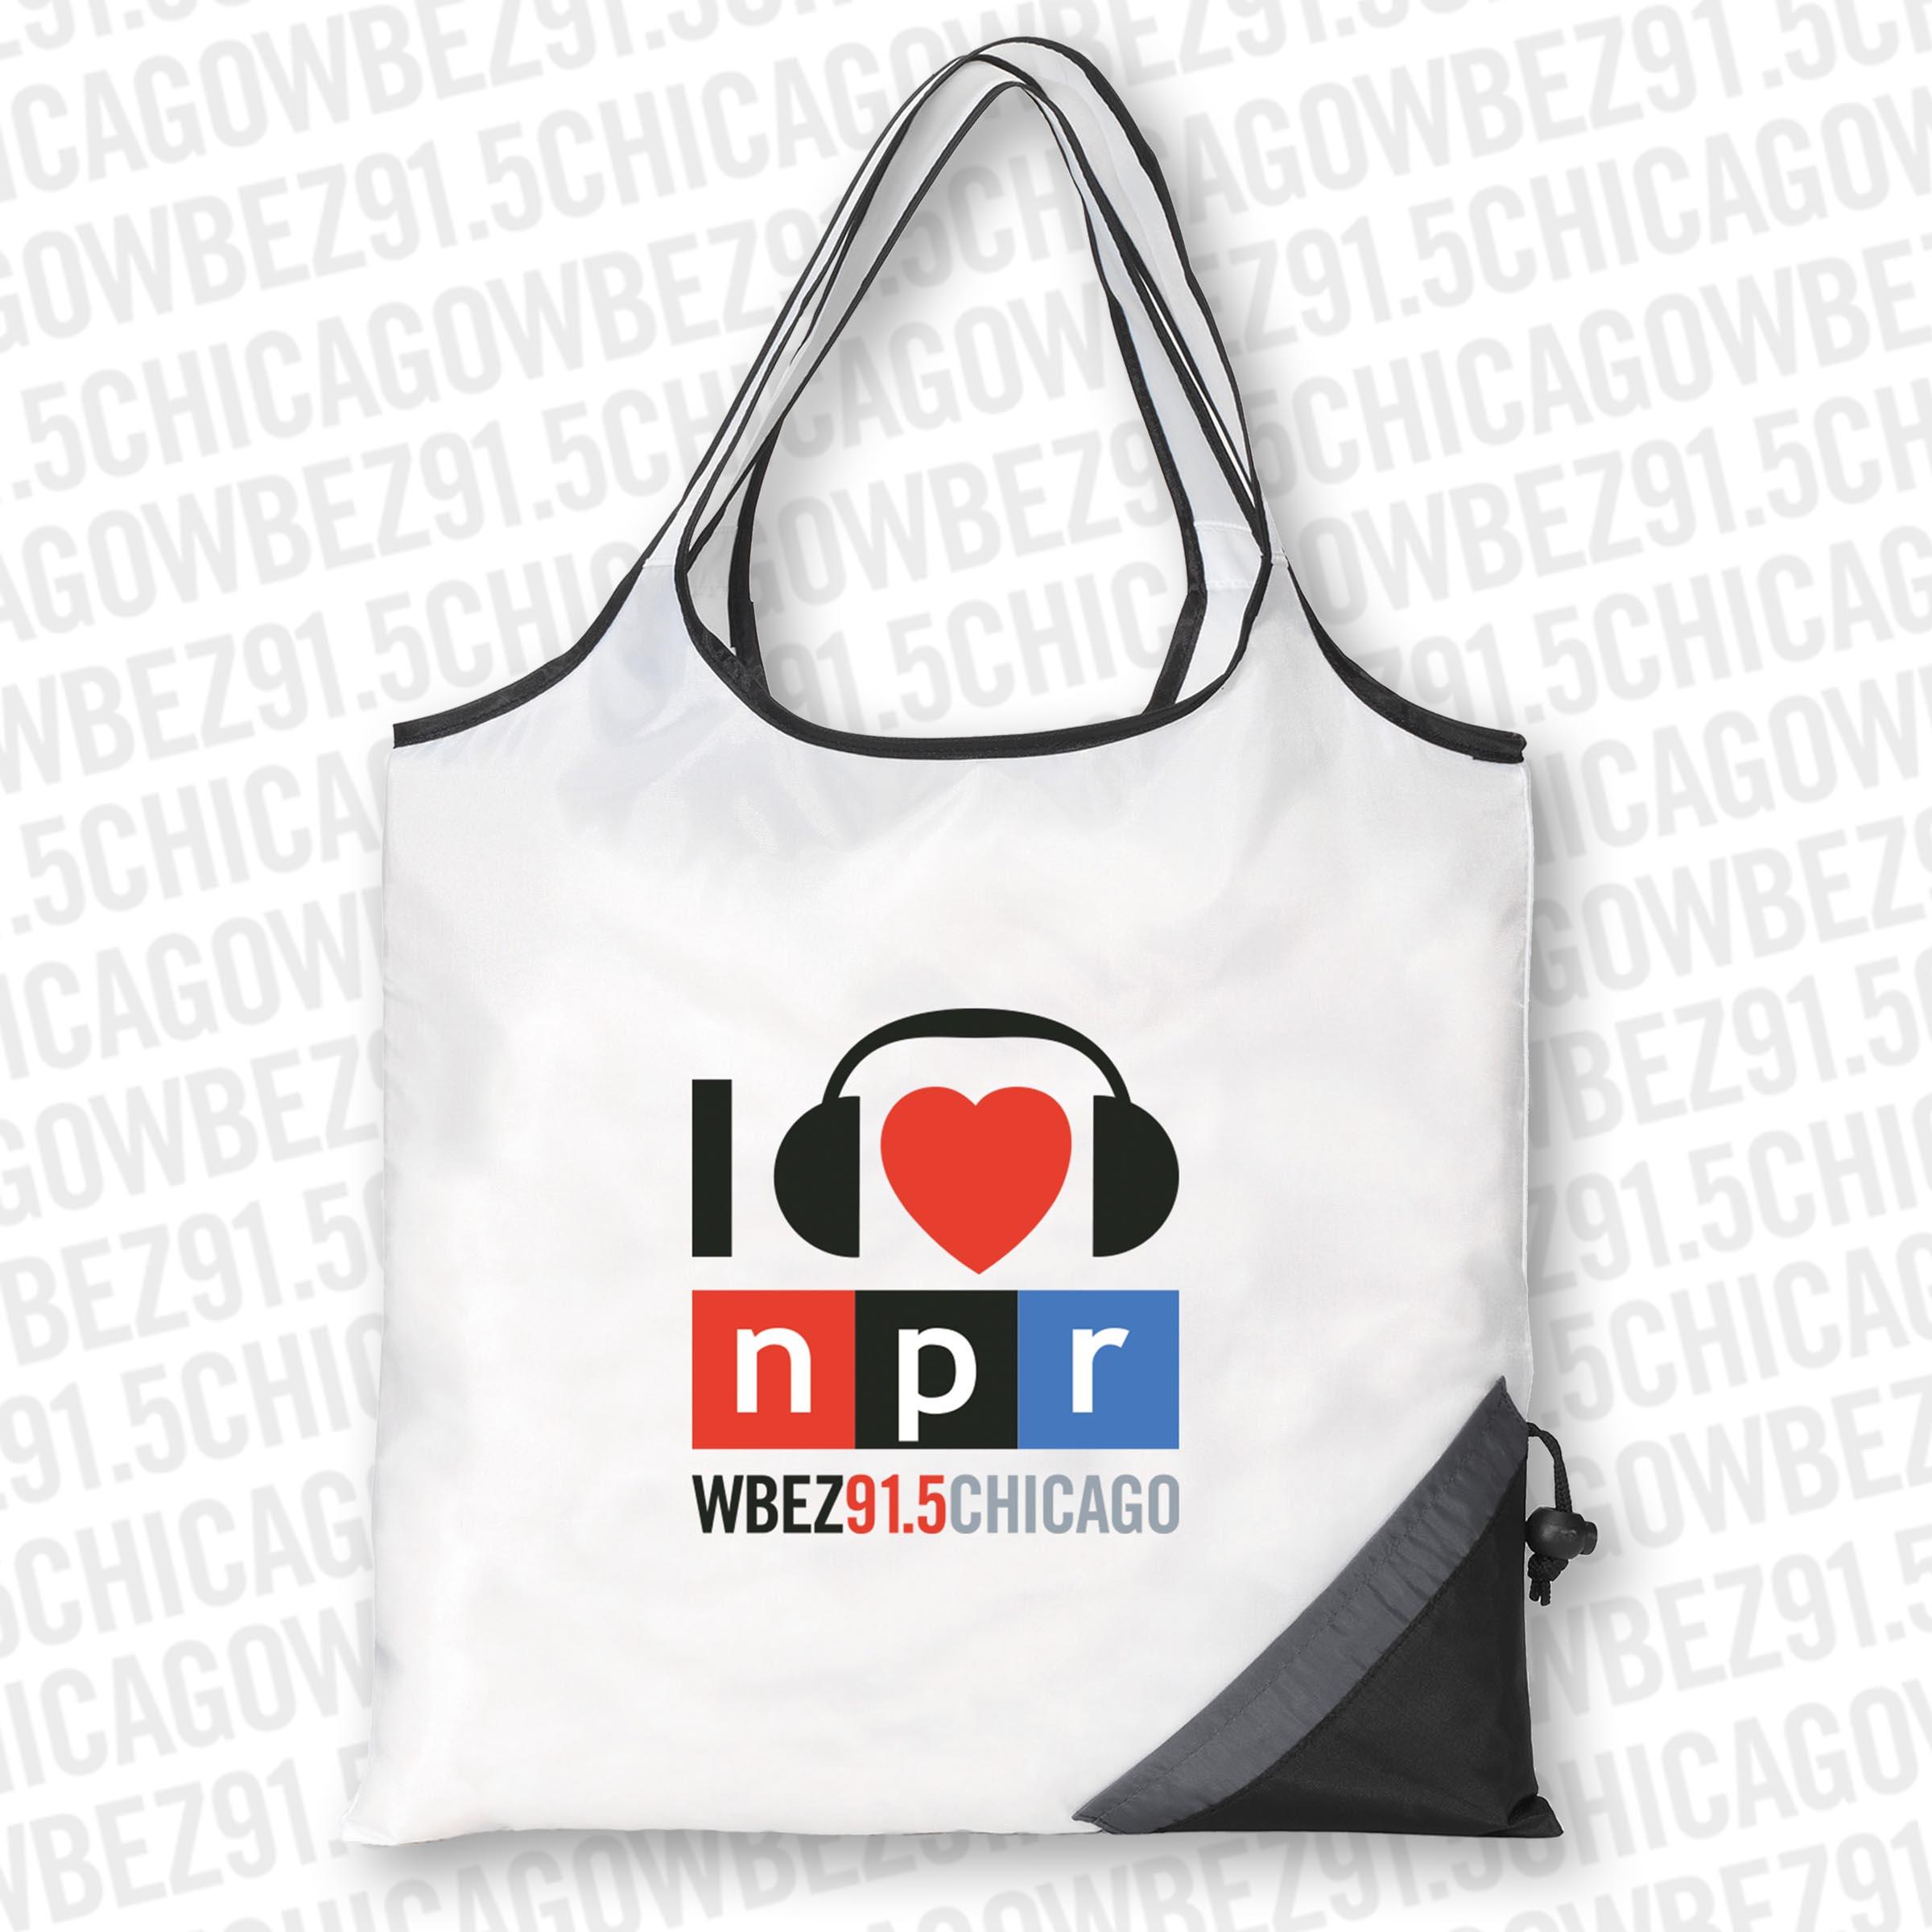 I Heart NPR Foldable Bag